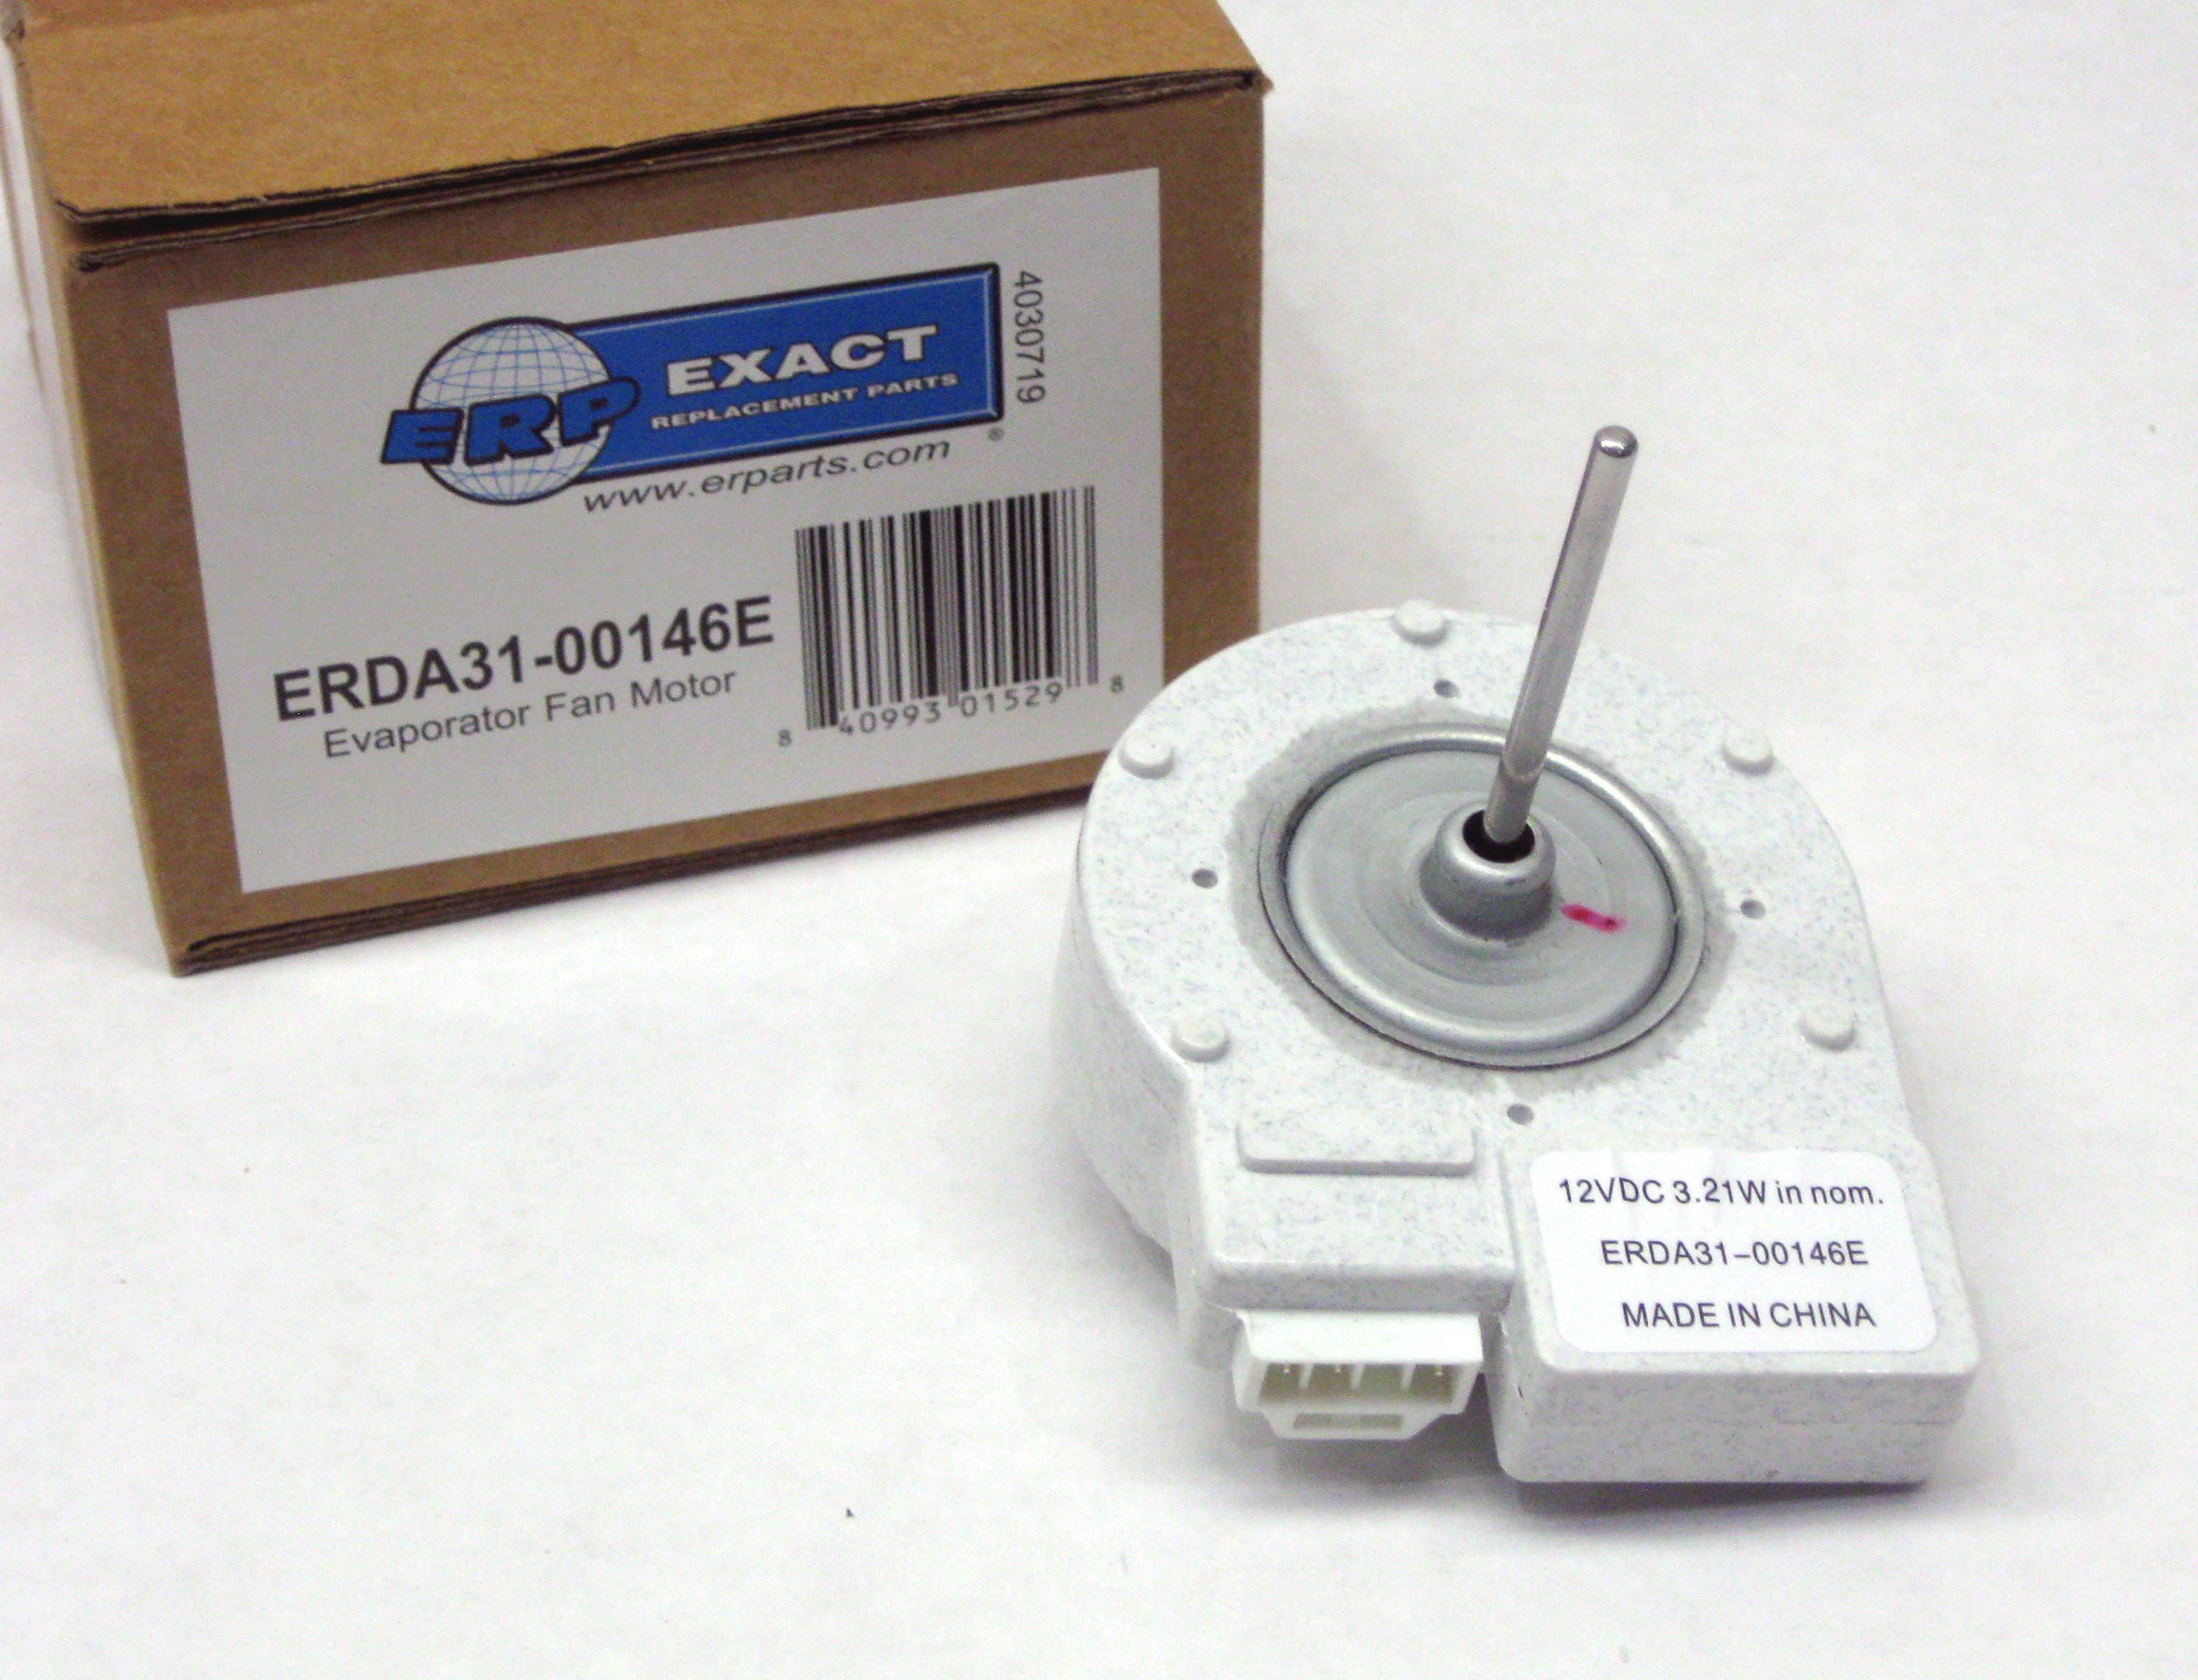 Exact Replacement Parts Erda31-00146e Evaporator Motor